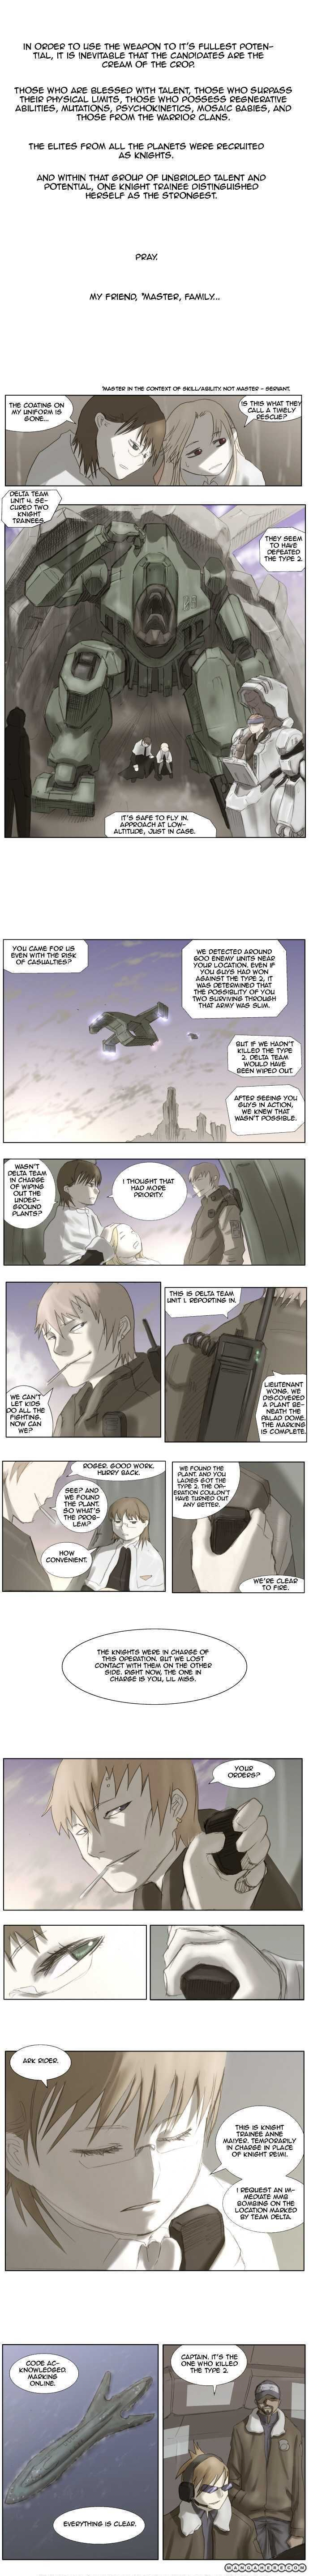 Knight Run 5 Page 2